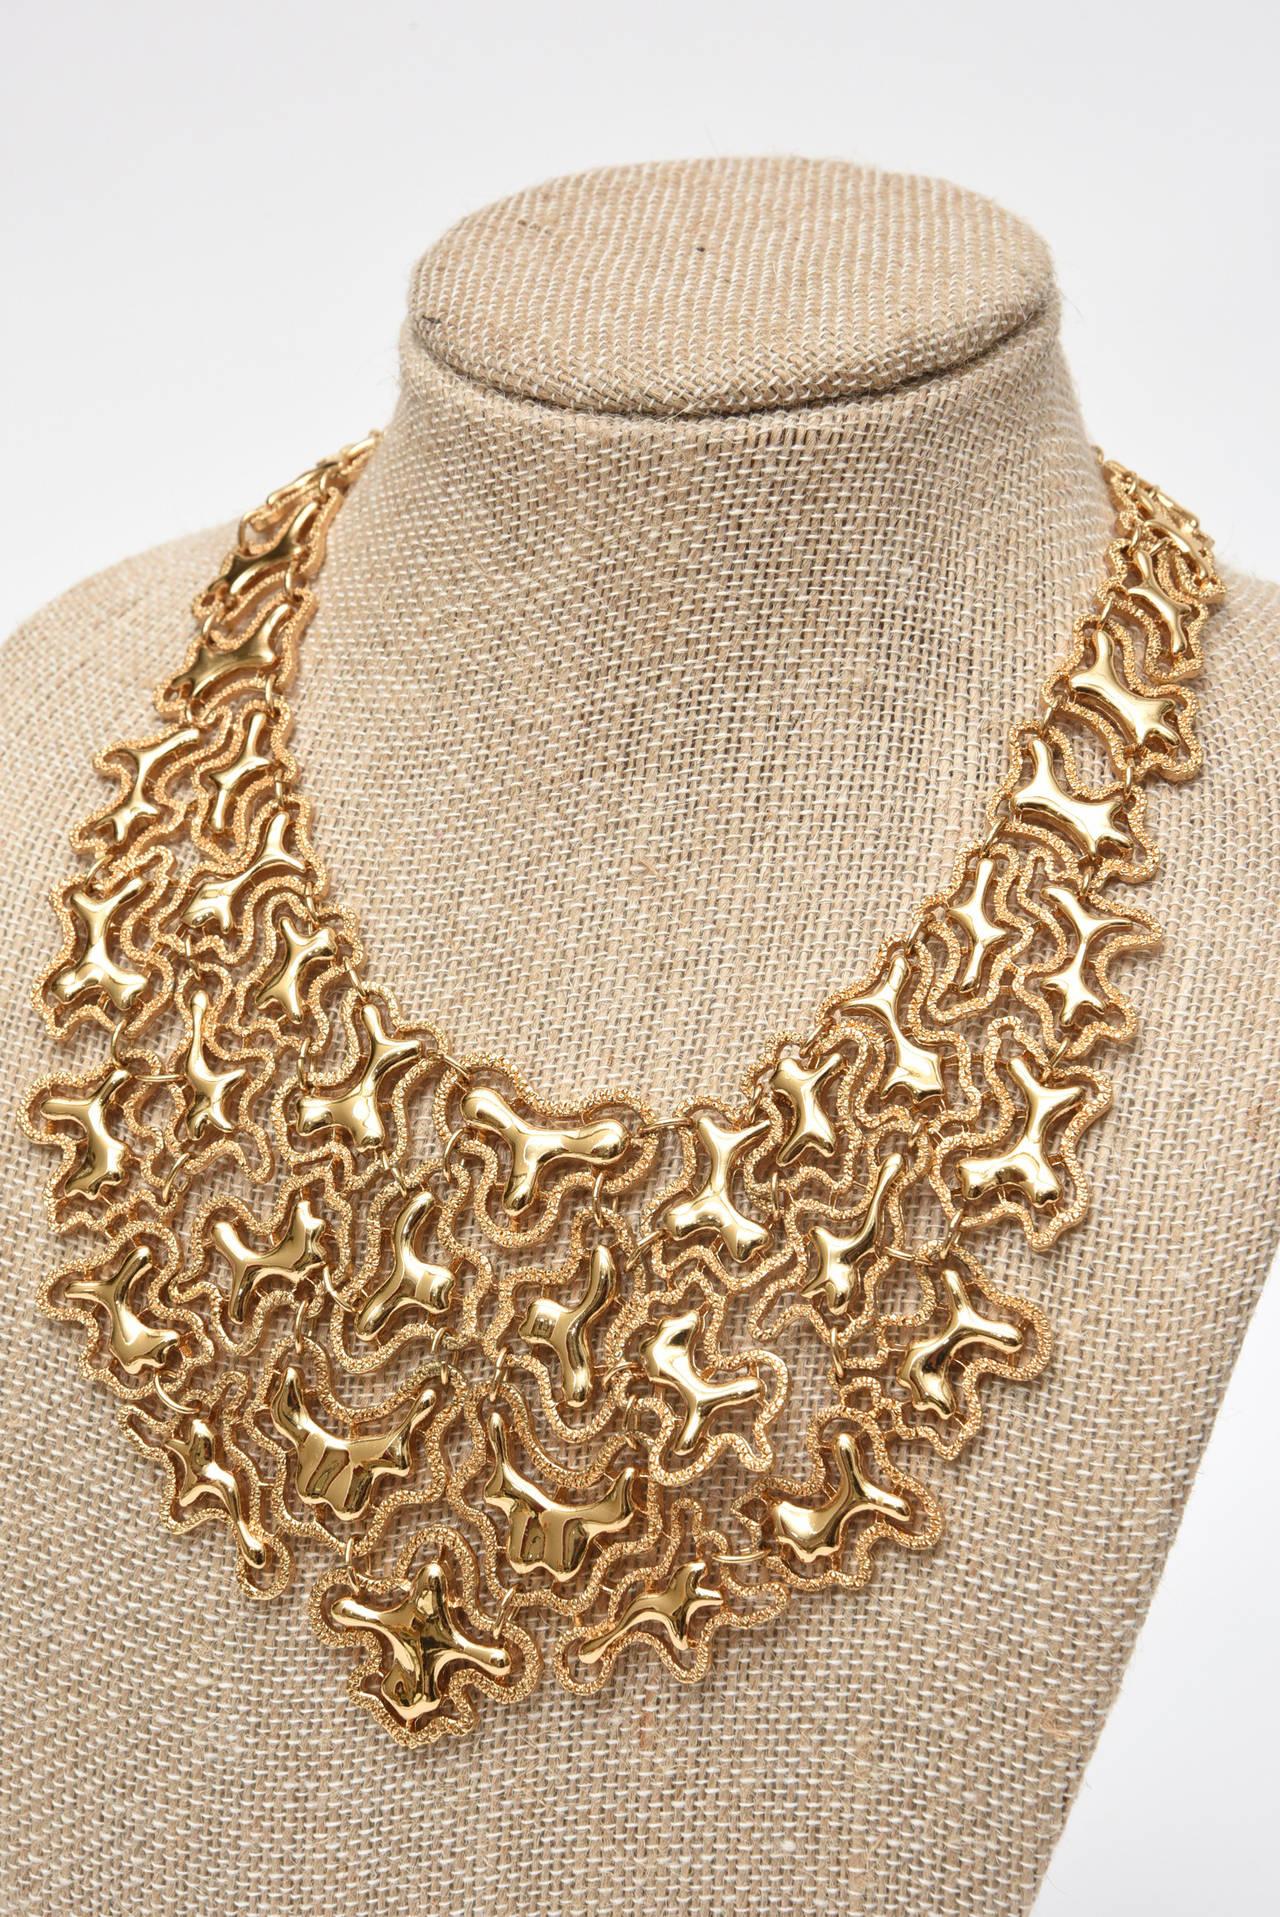 Monet Sculptural Bib Necklace Vintage For Sale 2